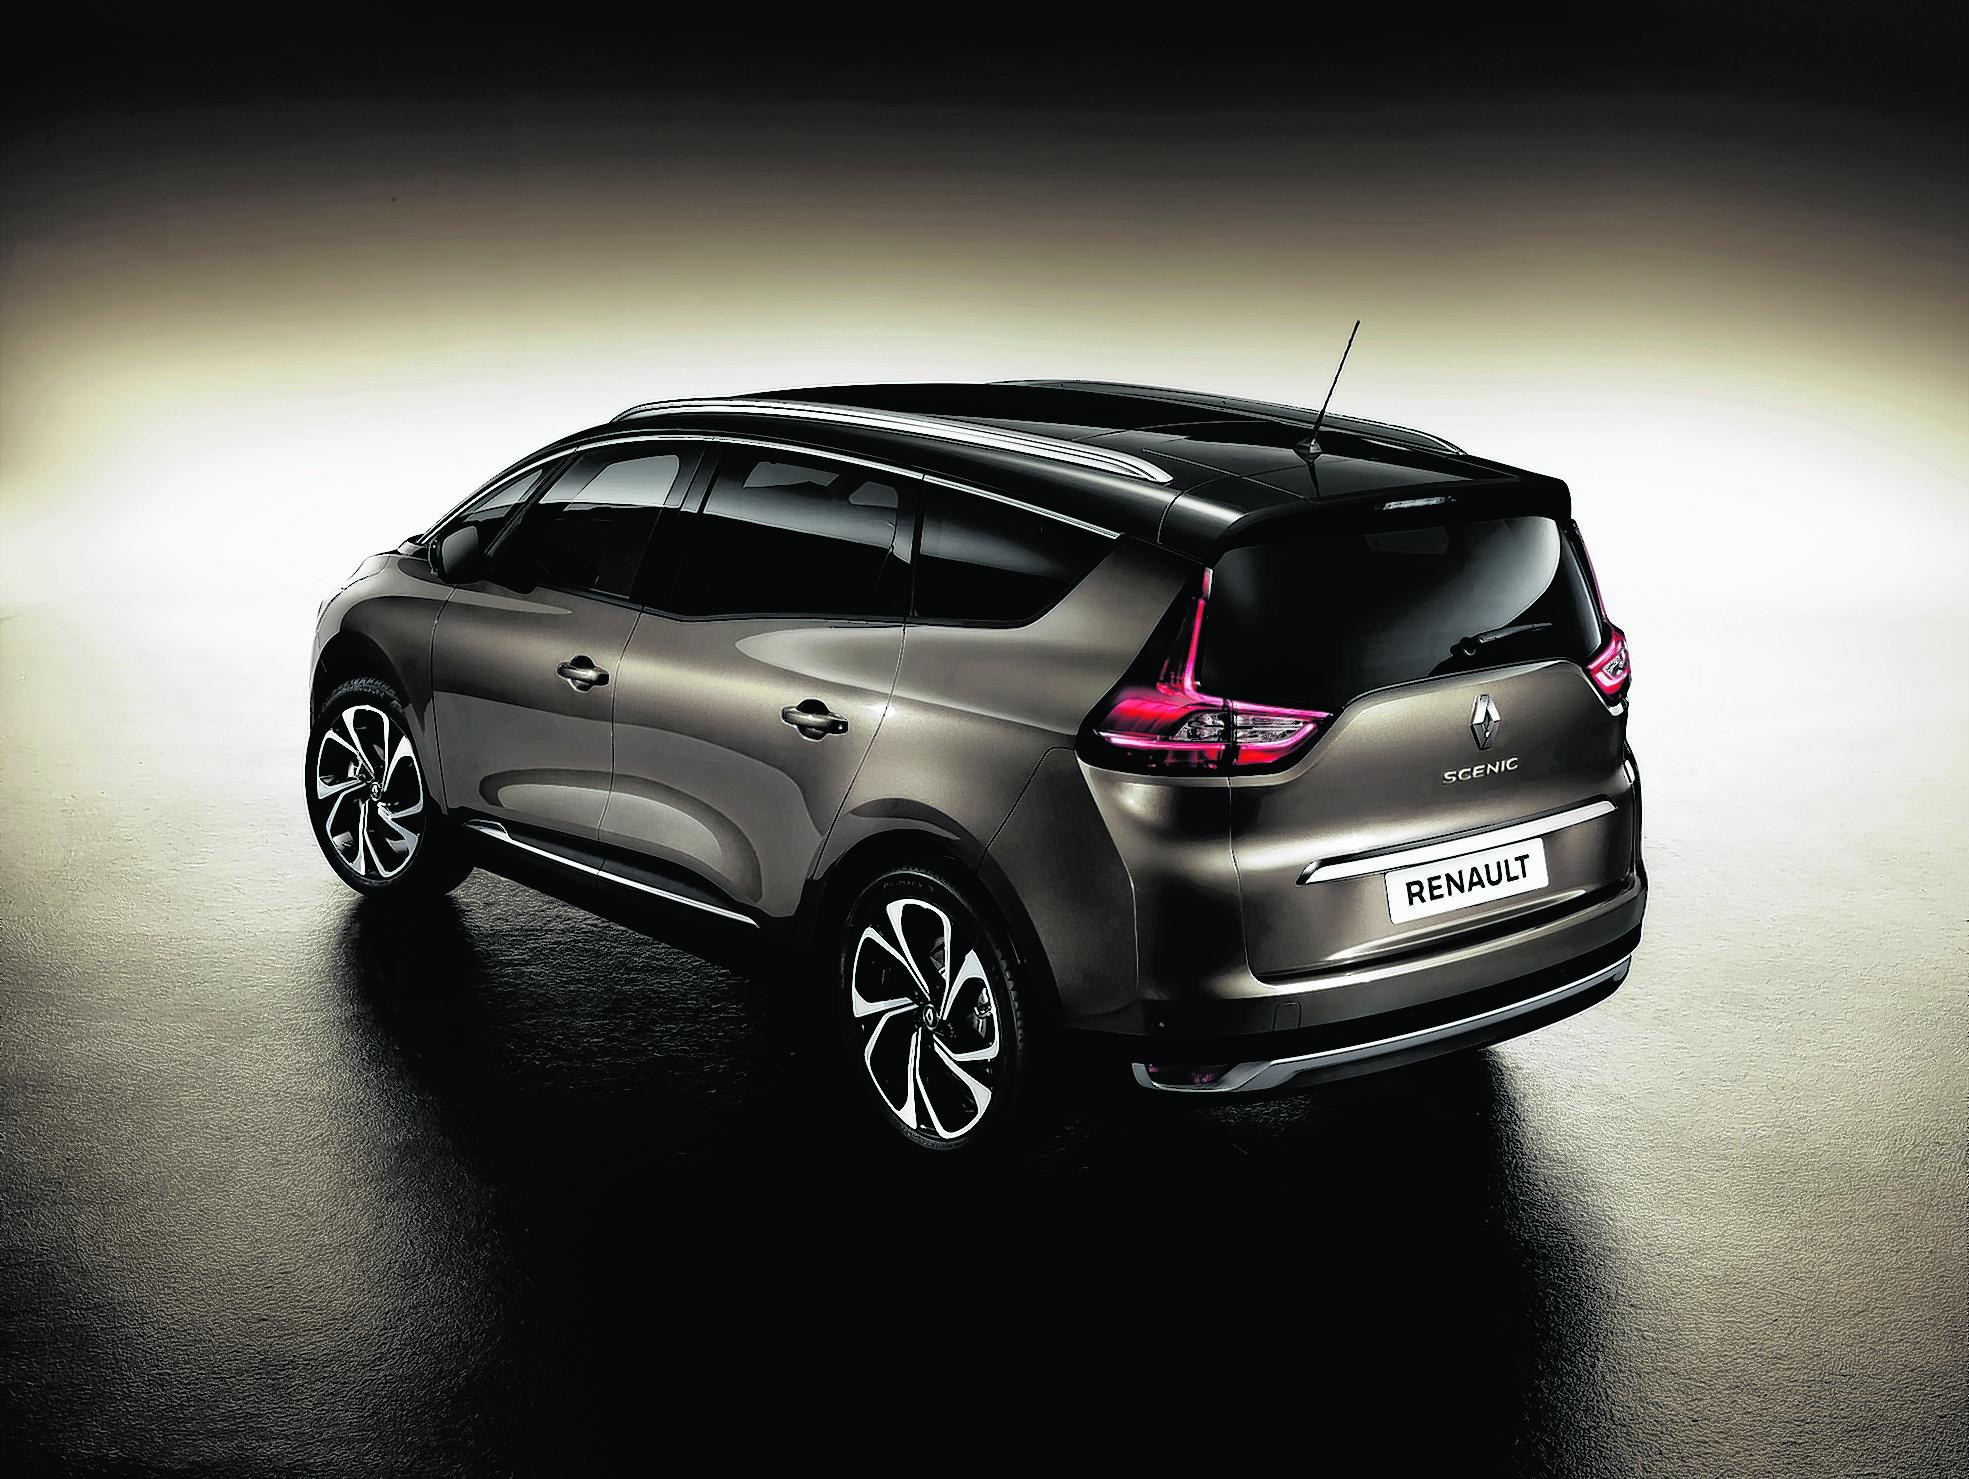 yc-Renault2